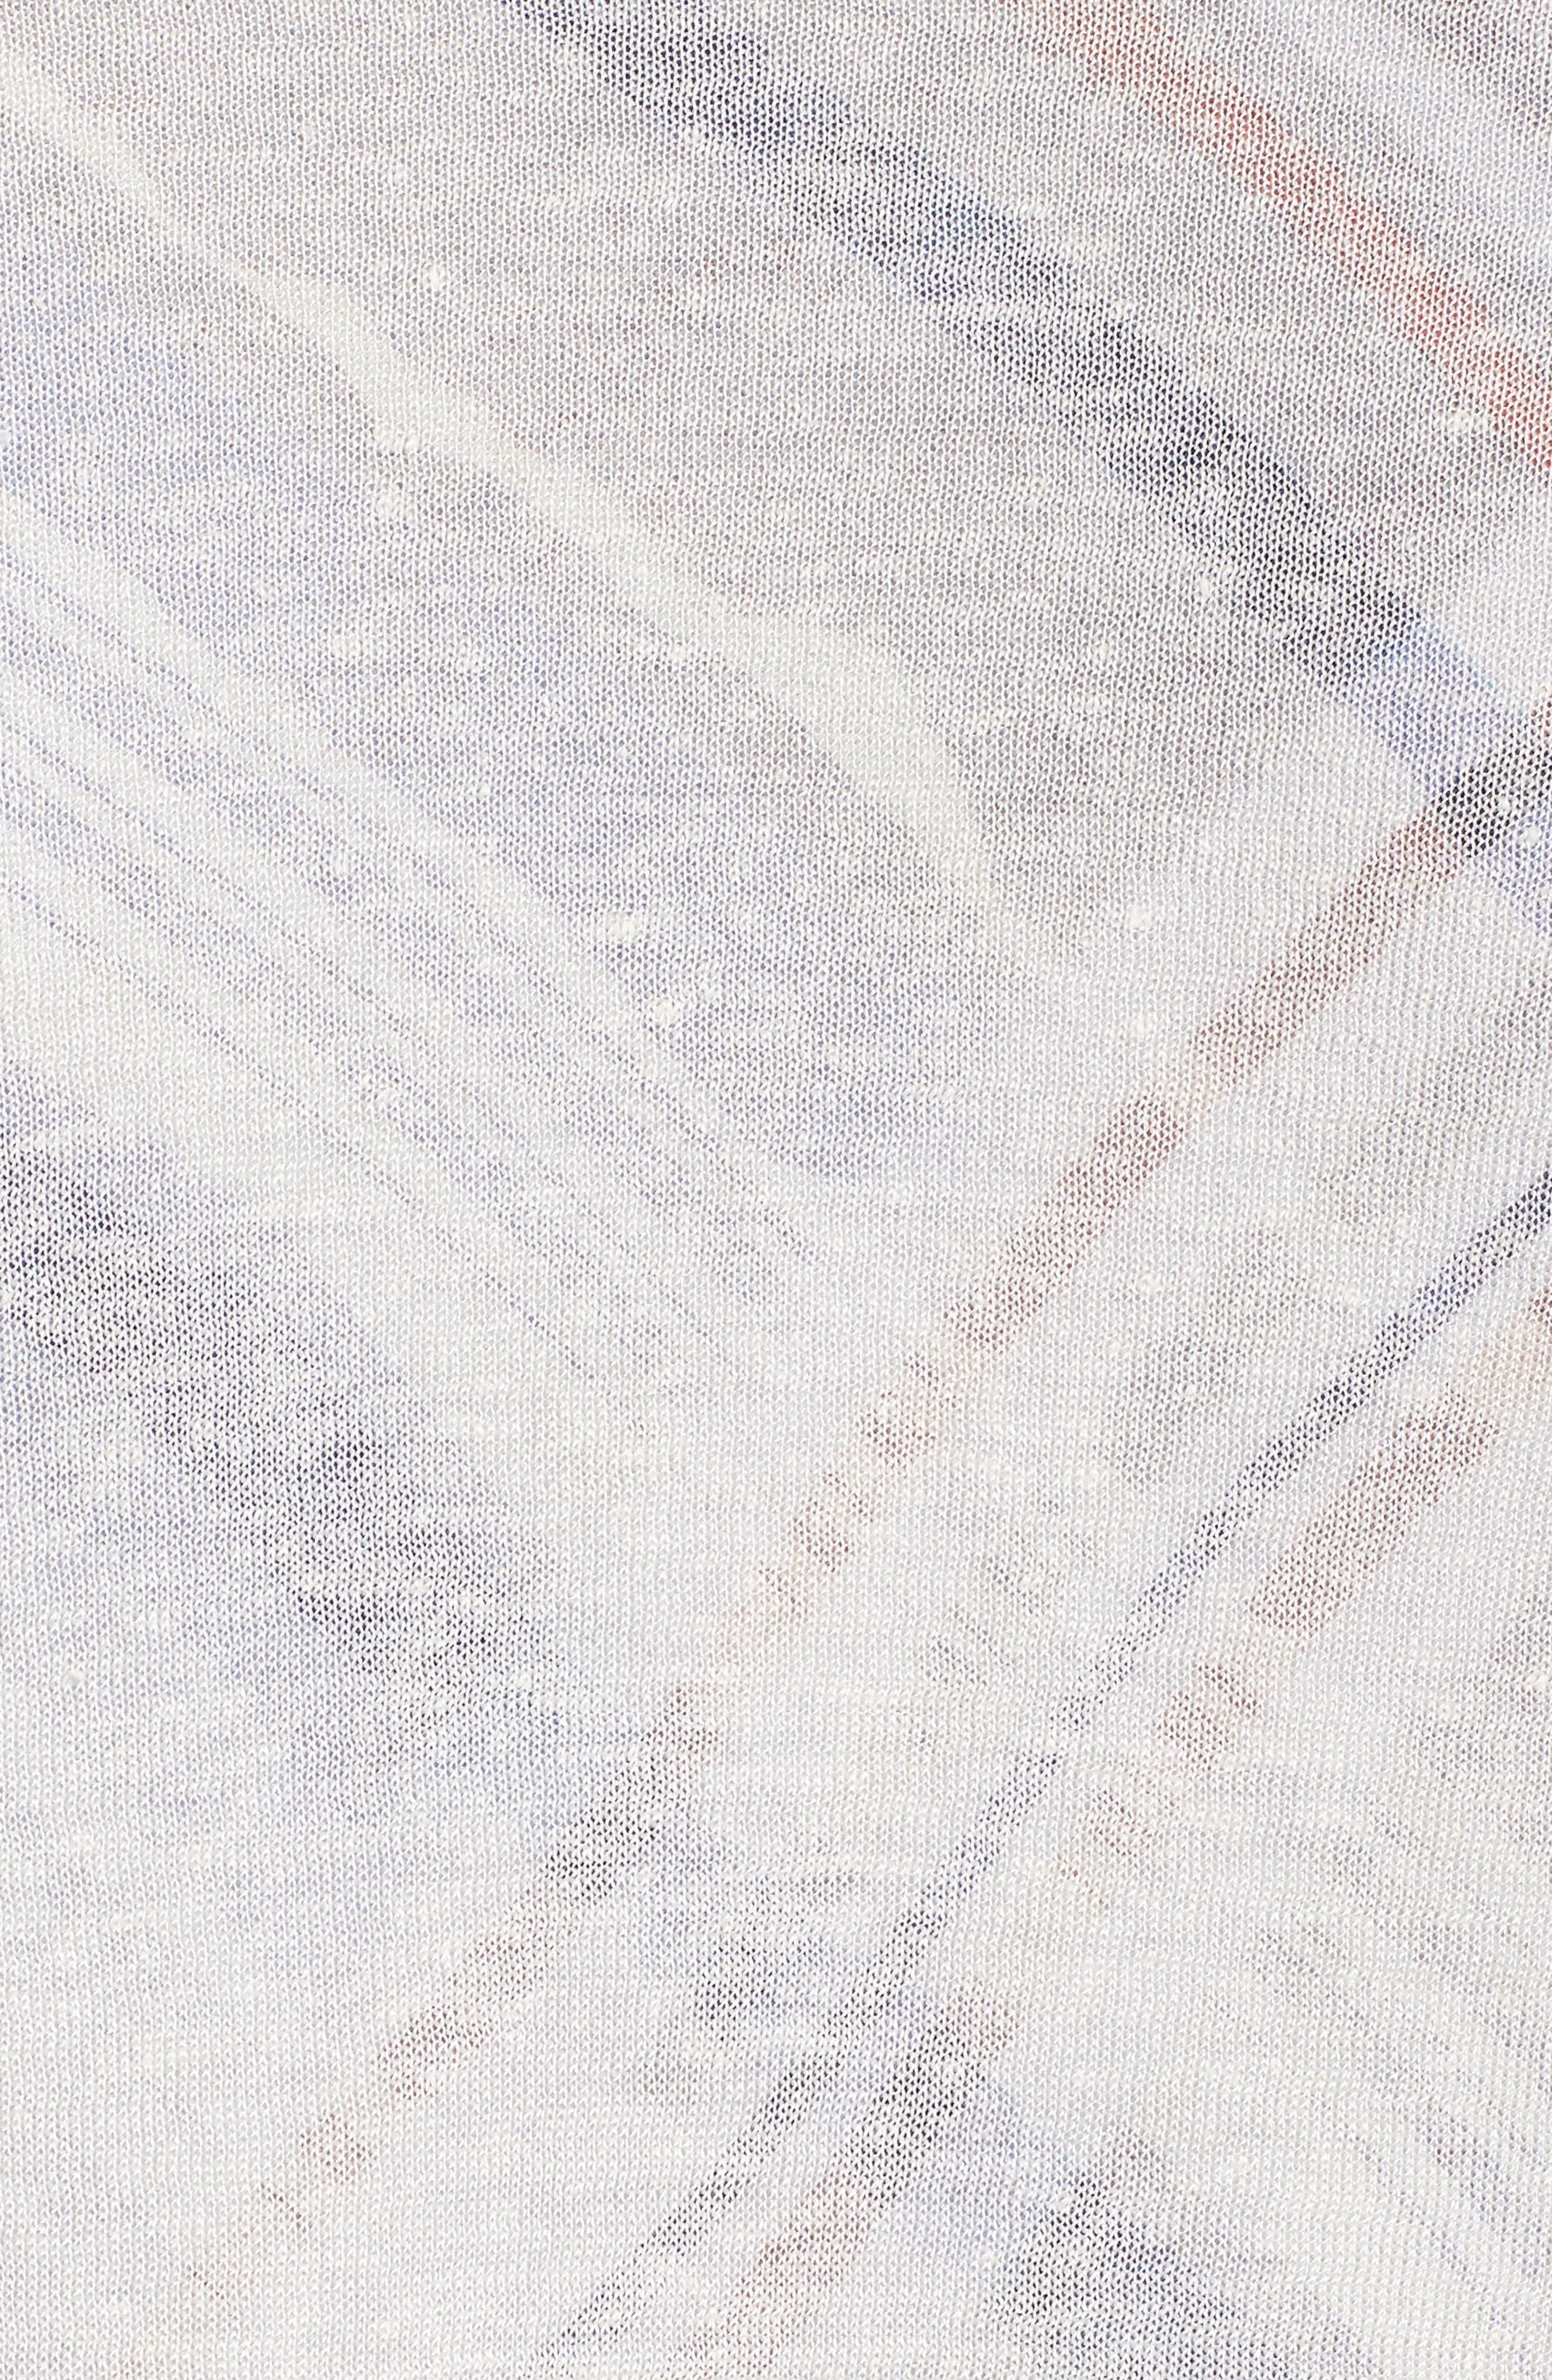 Four-Way Convertible Cardigan,                             Alternate thumbnail 5, color,                             SMOKE